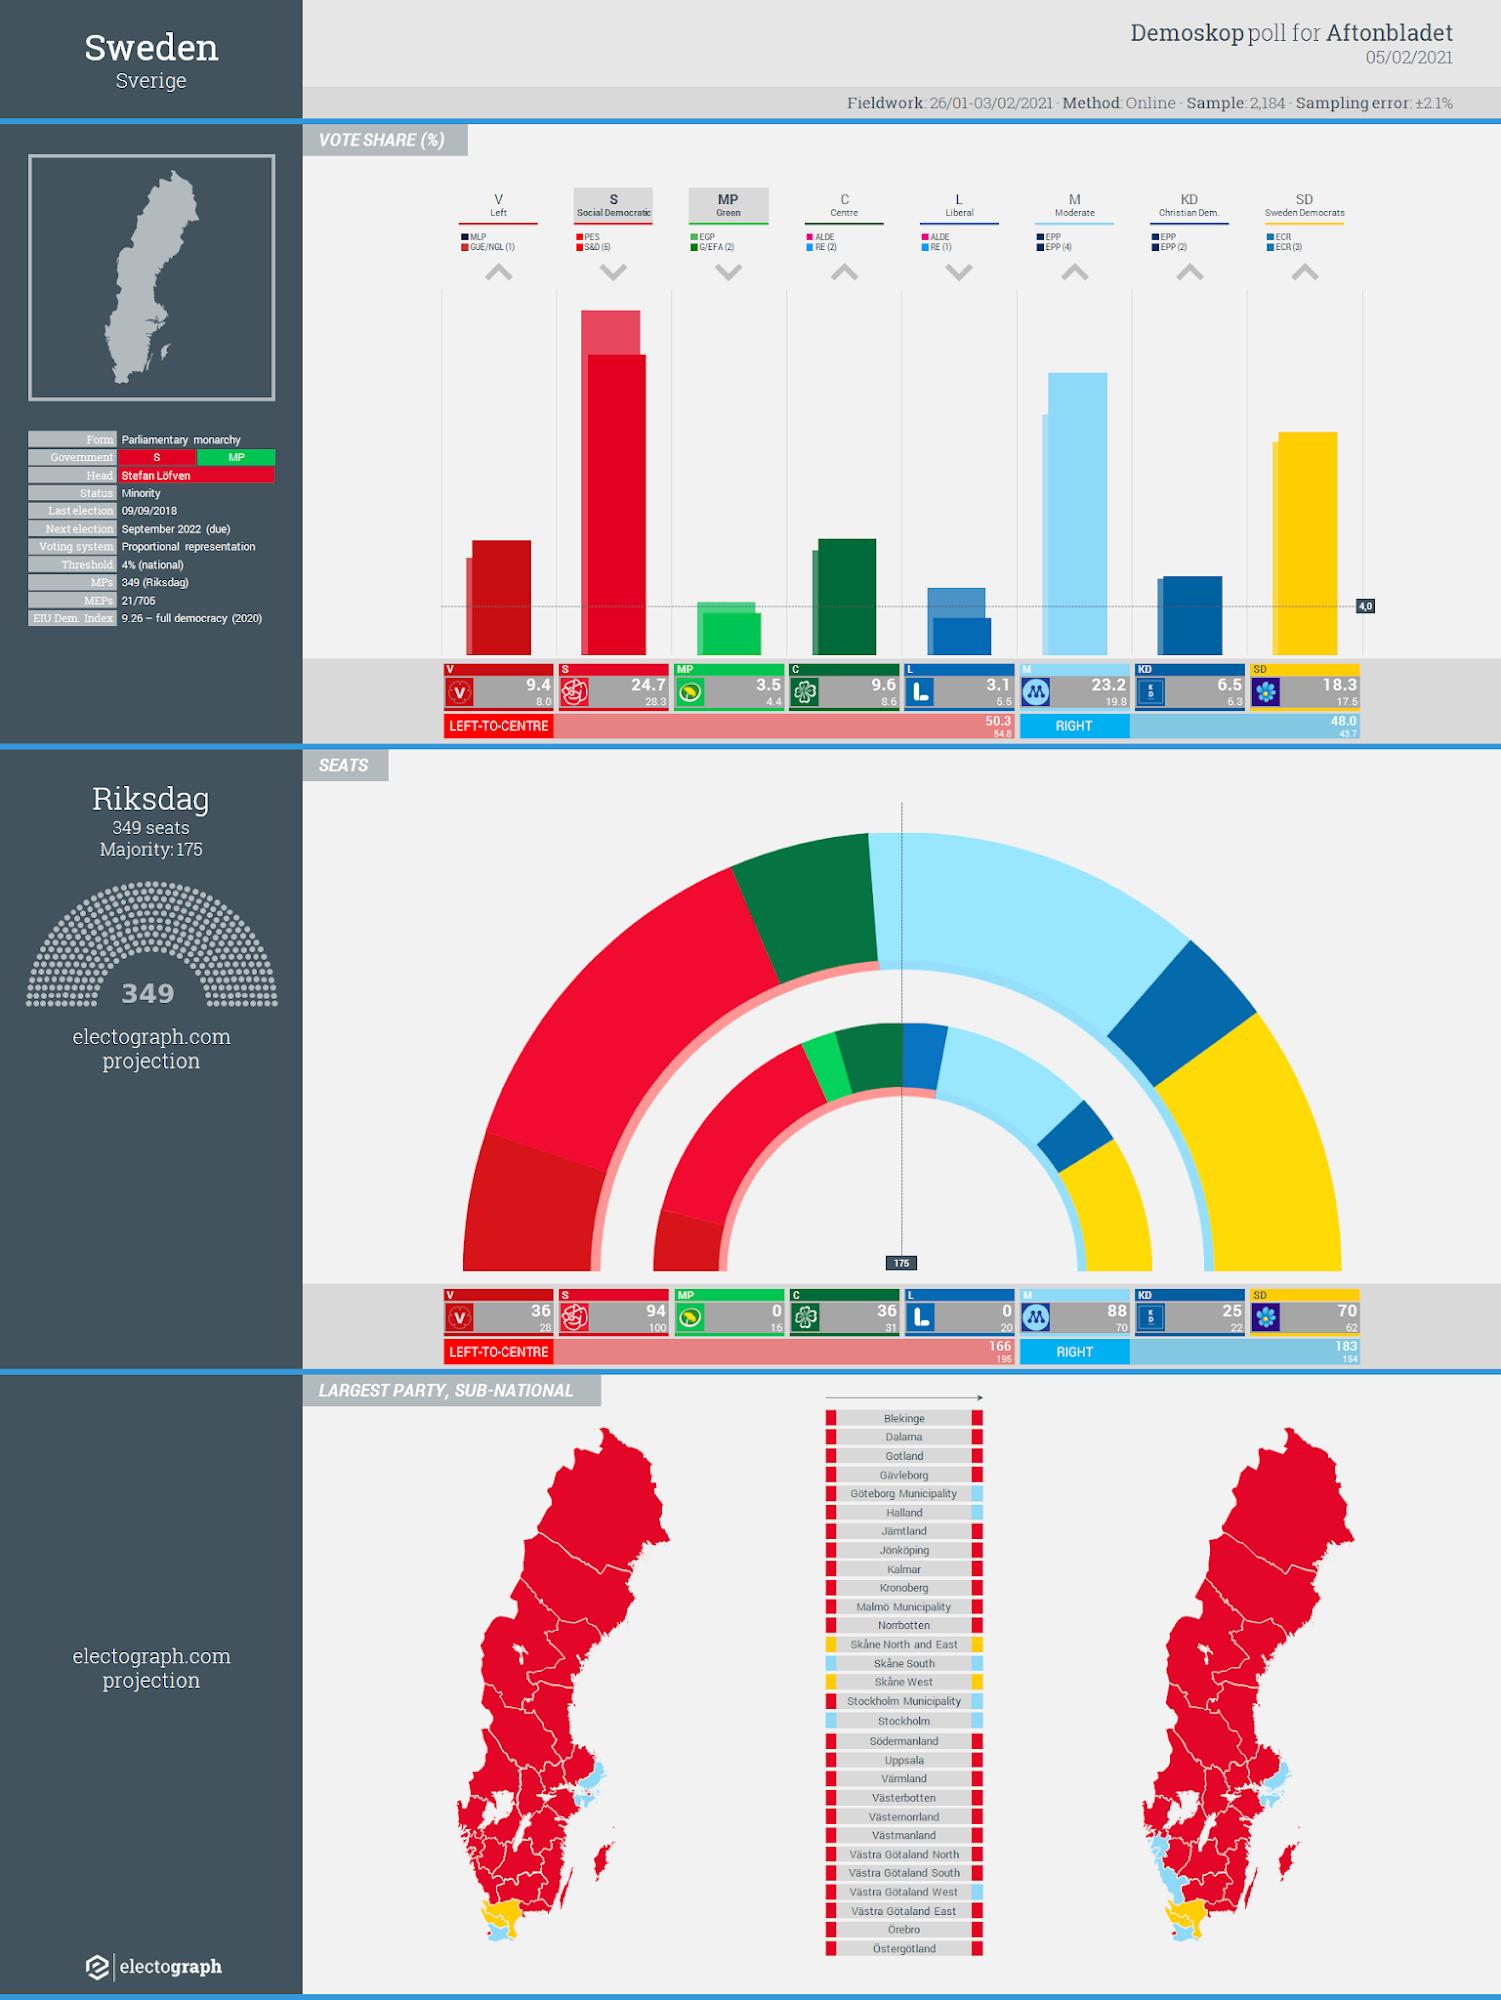 SWEDEN: Demoskop poll chart for Aftonbladet, 5 February 2021